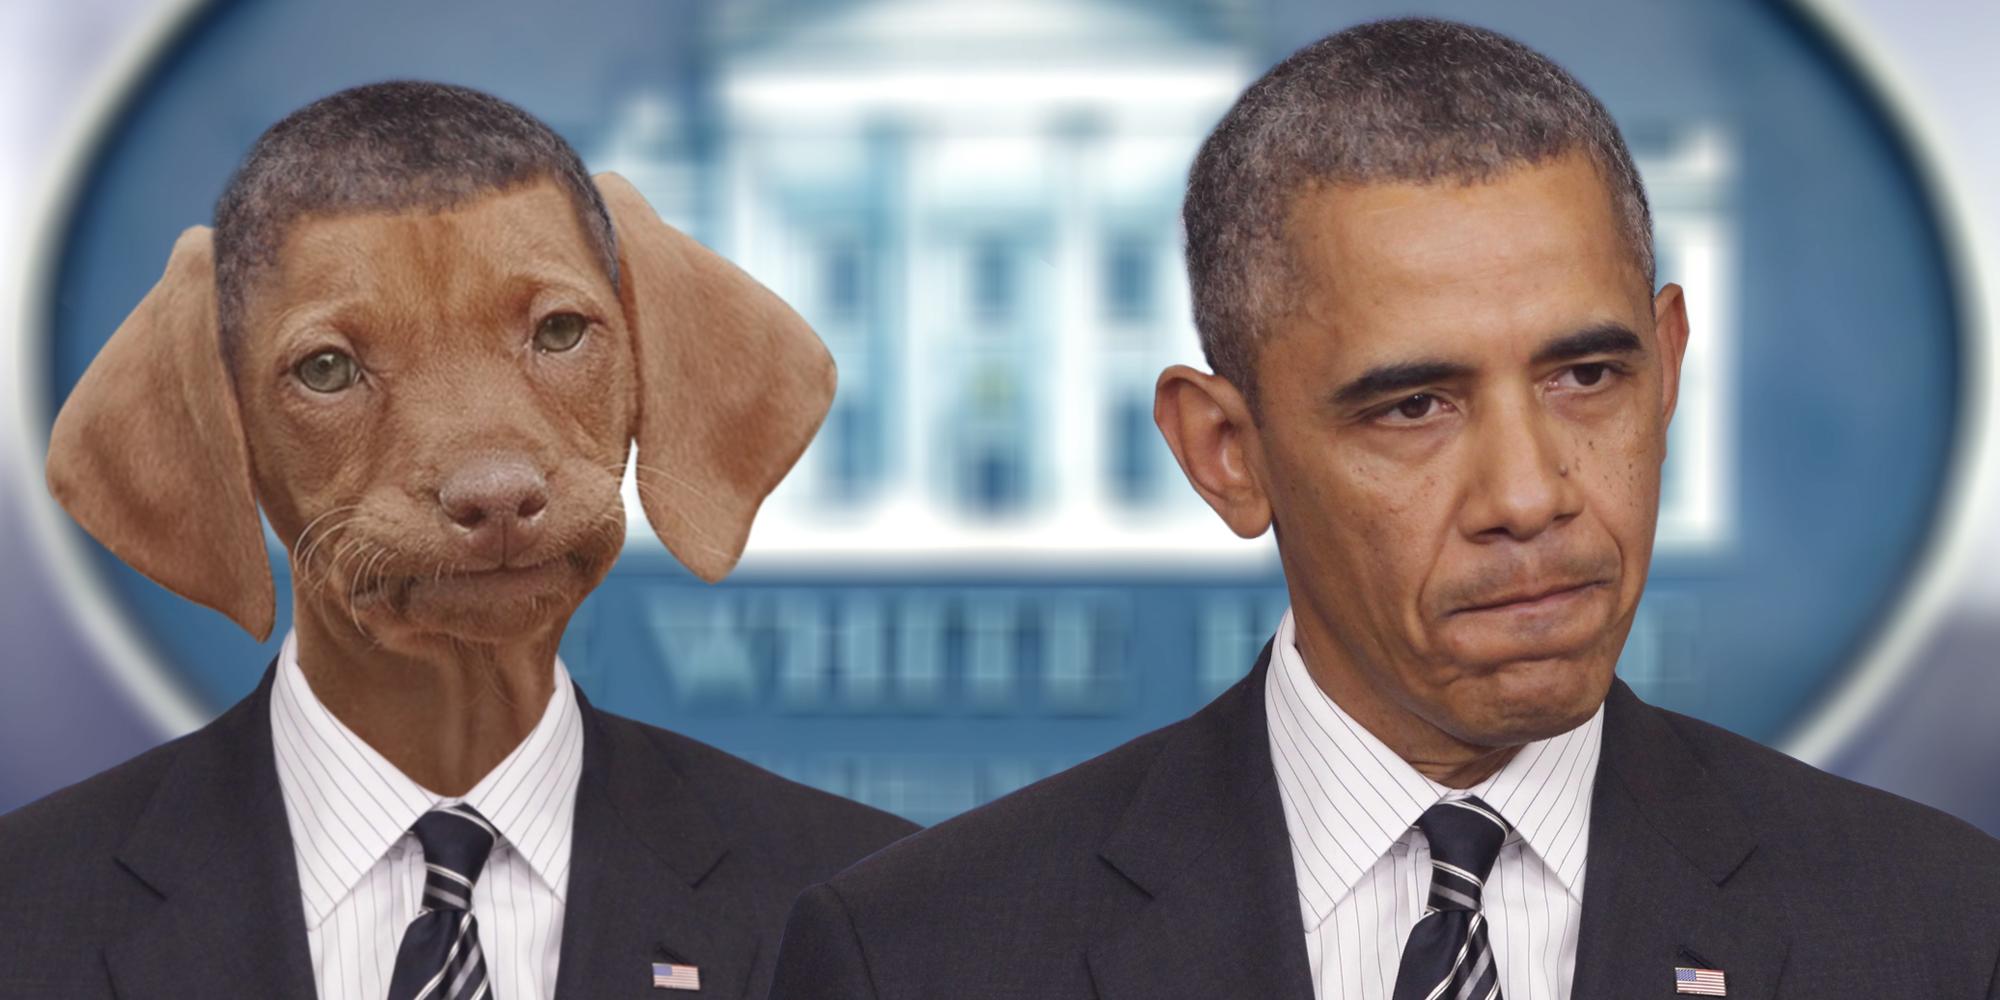 Barack Odoga doesn't approve.